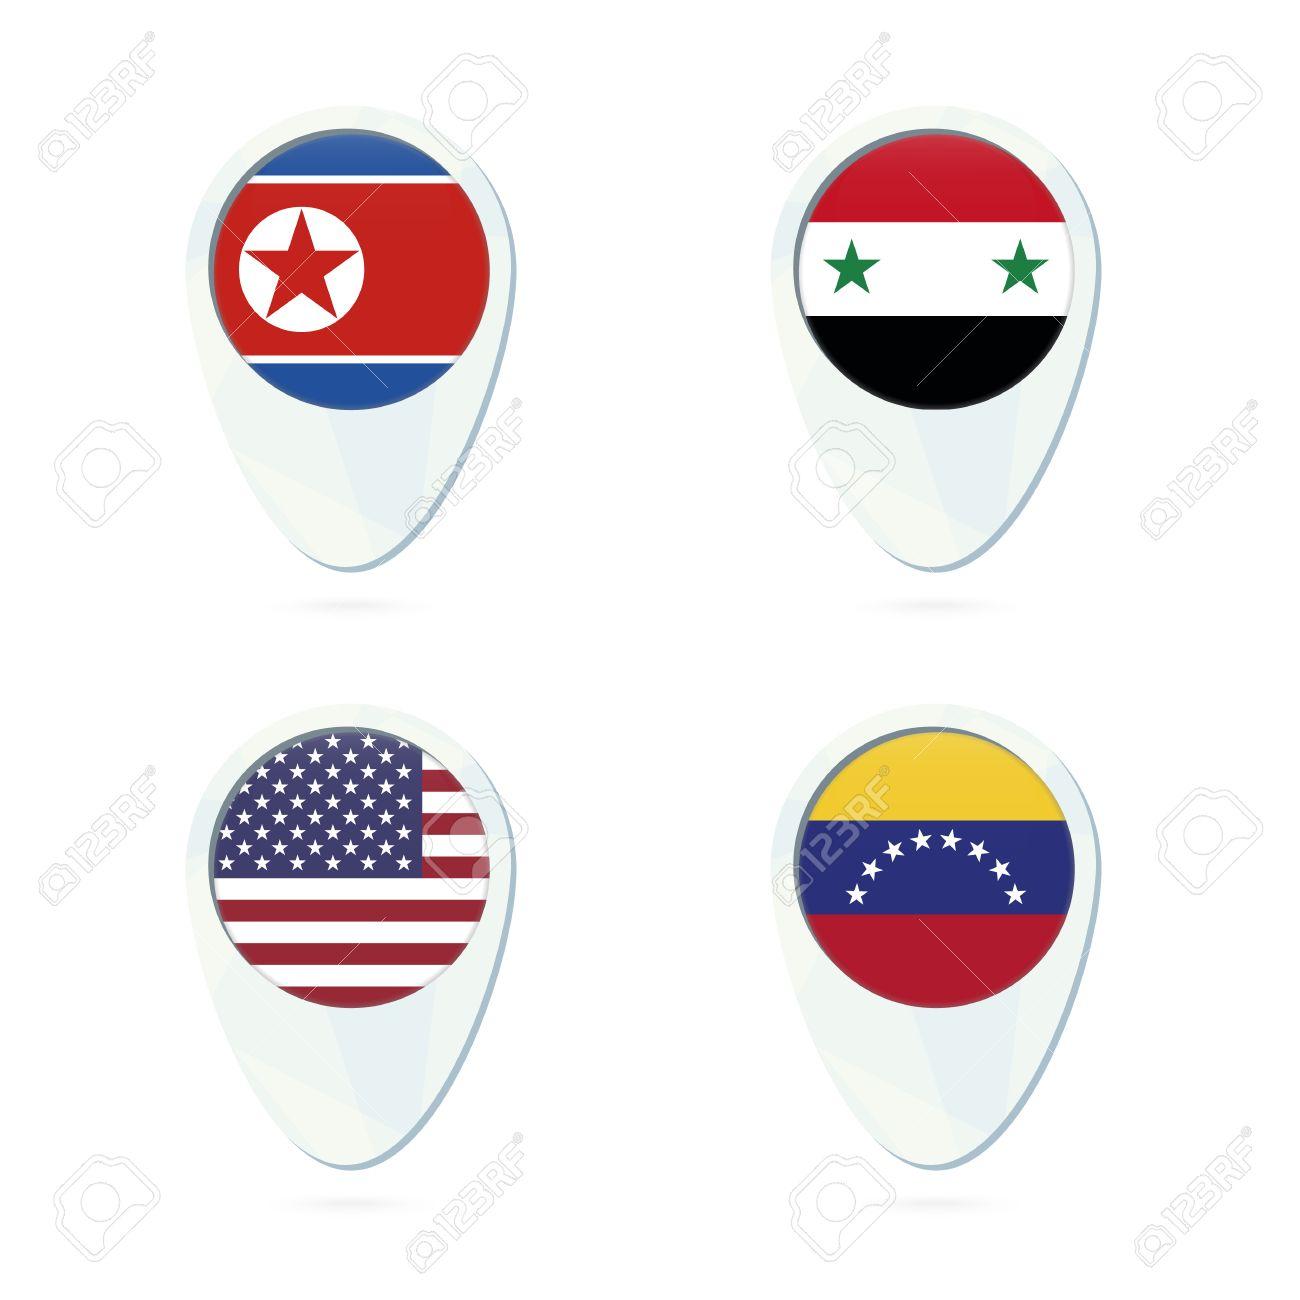 North korea syria usa venezuela flag location map pin icon north korea syria usa venezuela flag location map pin icon north korea sciox Choice Image